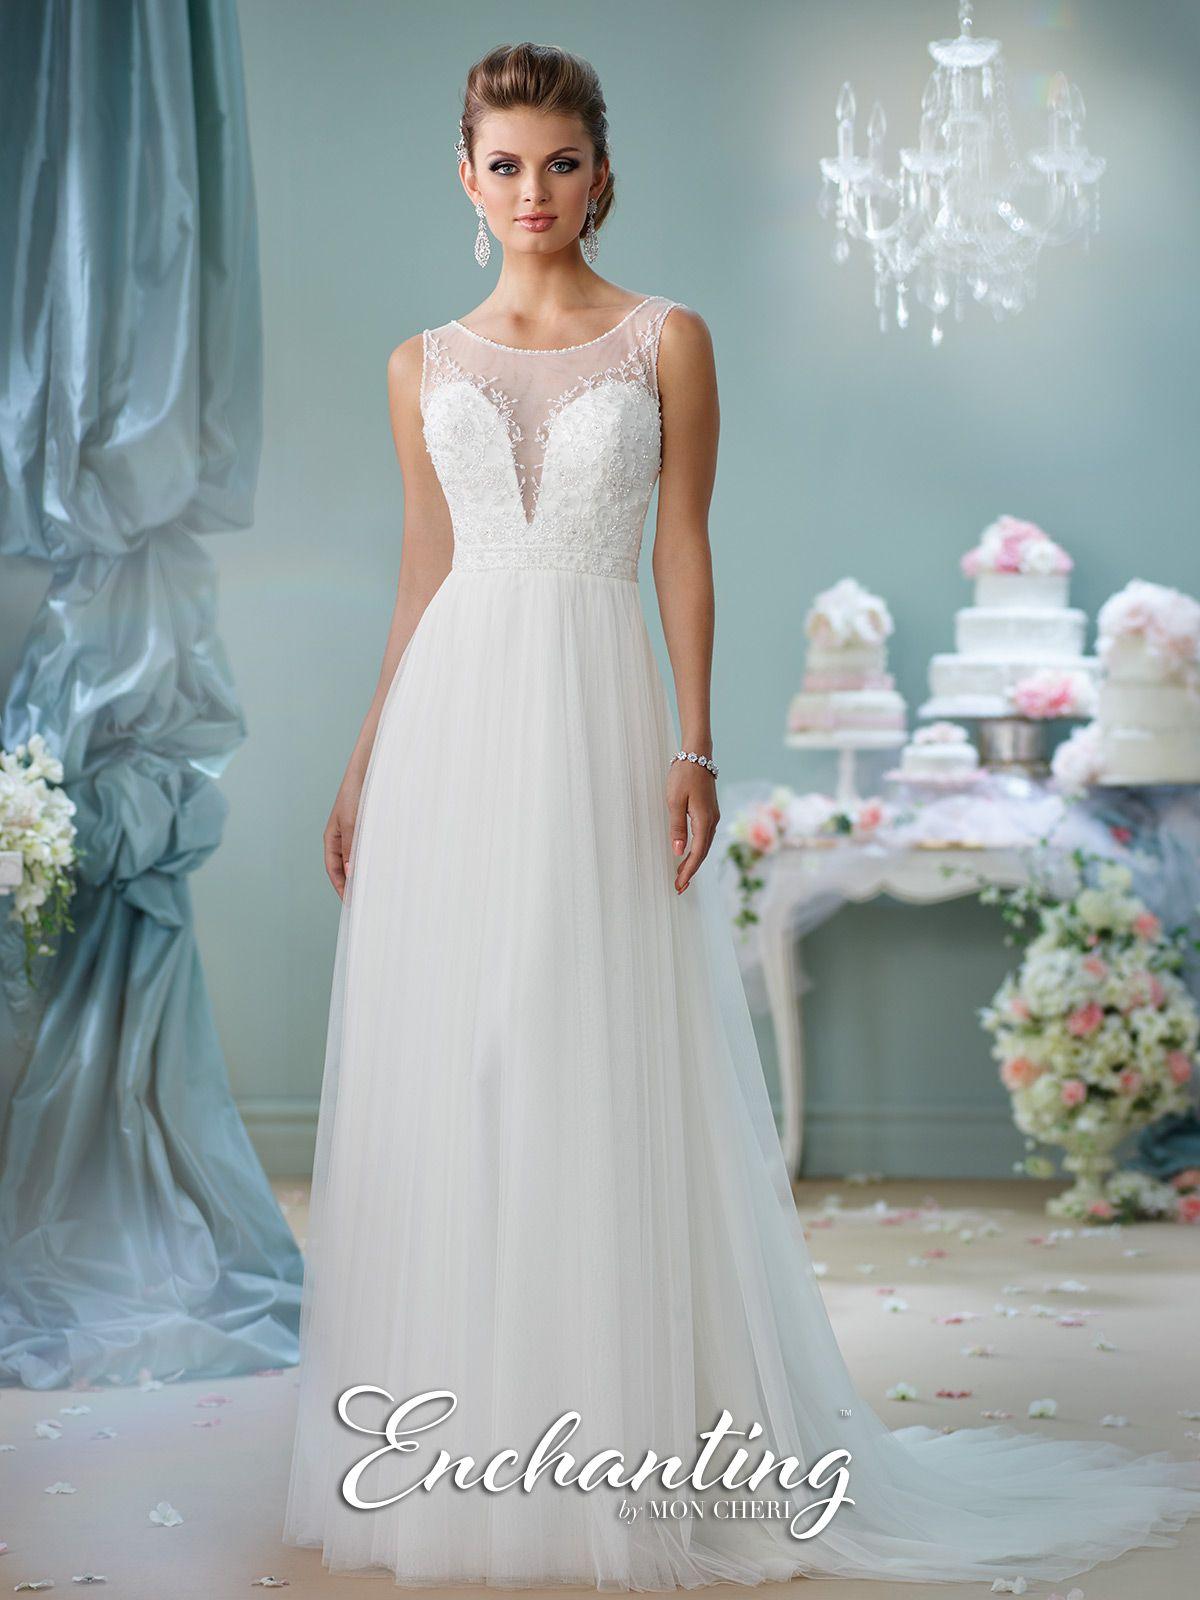 Modern wedding dresses by mon cheri pinterest bateau